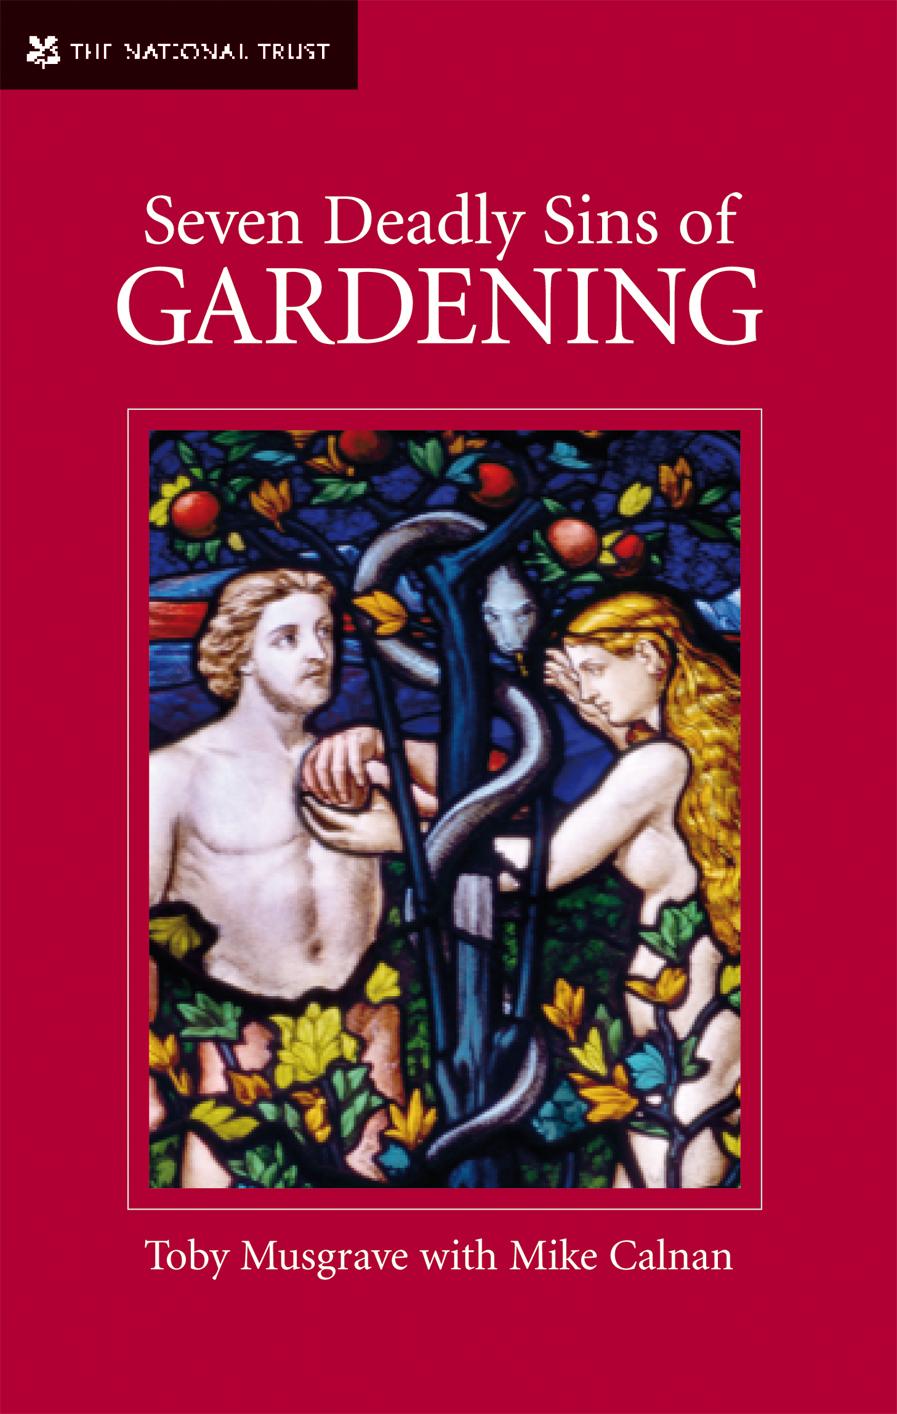 Seven Deadly Sins of Gardening